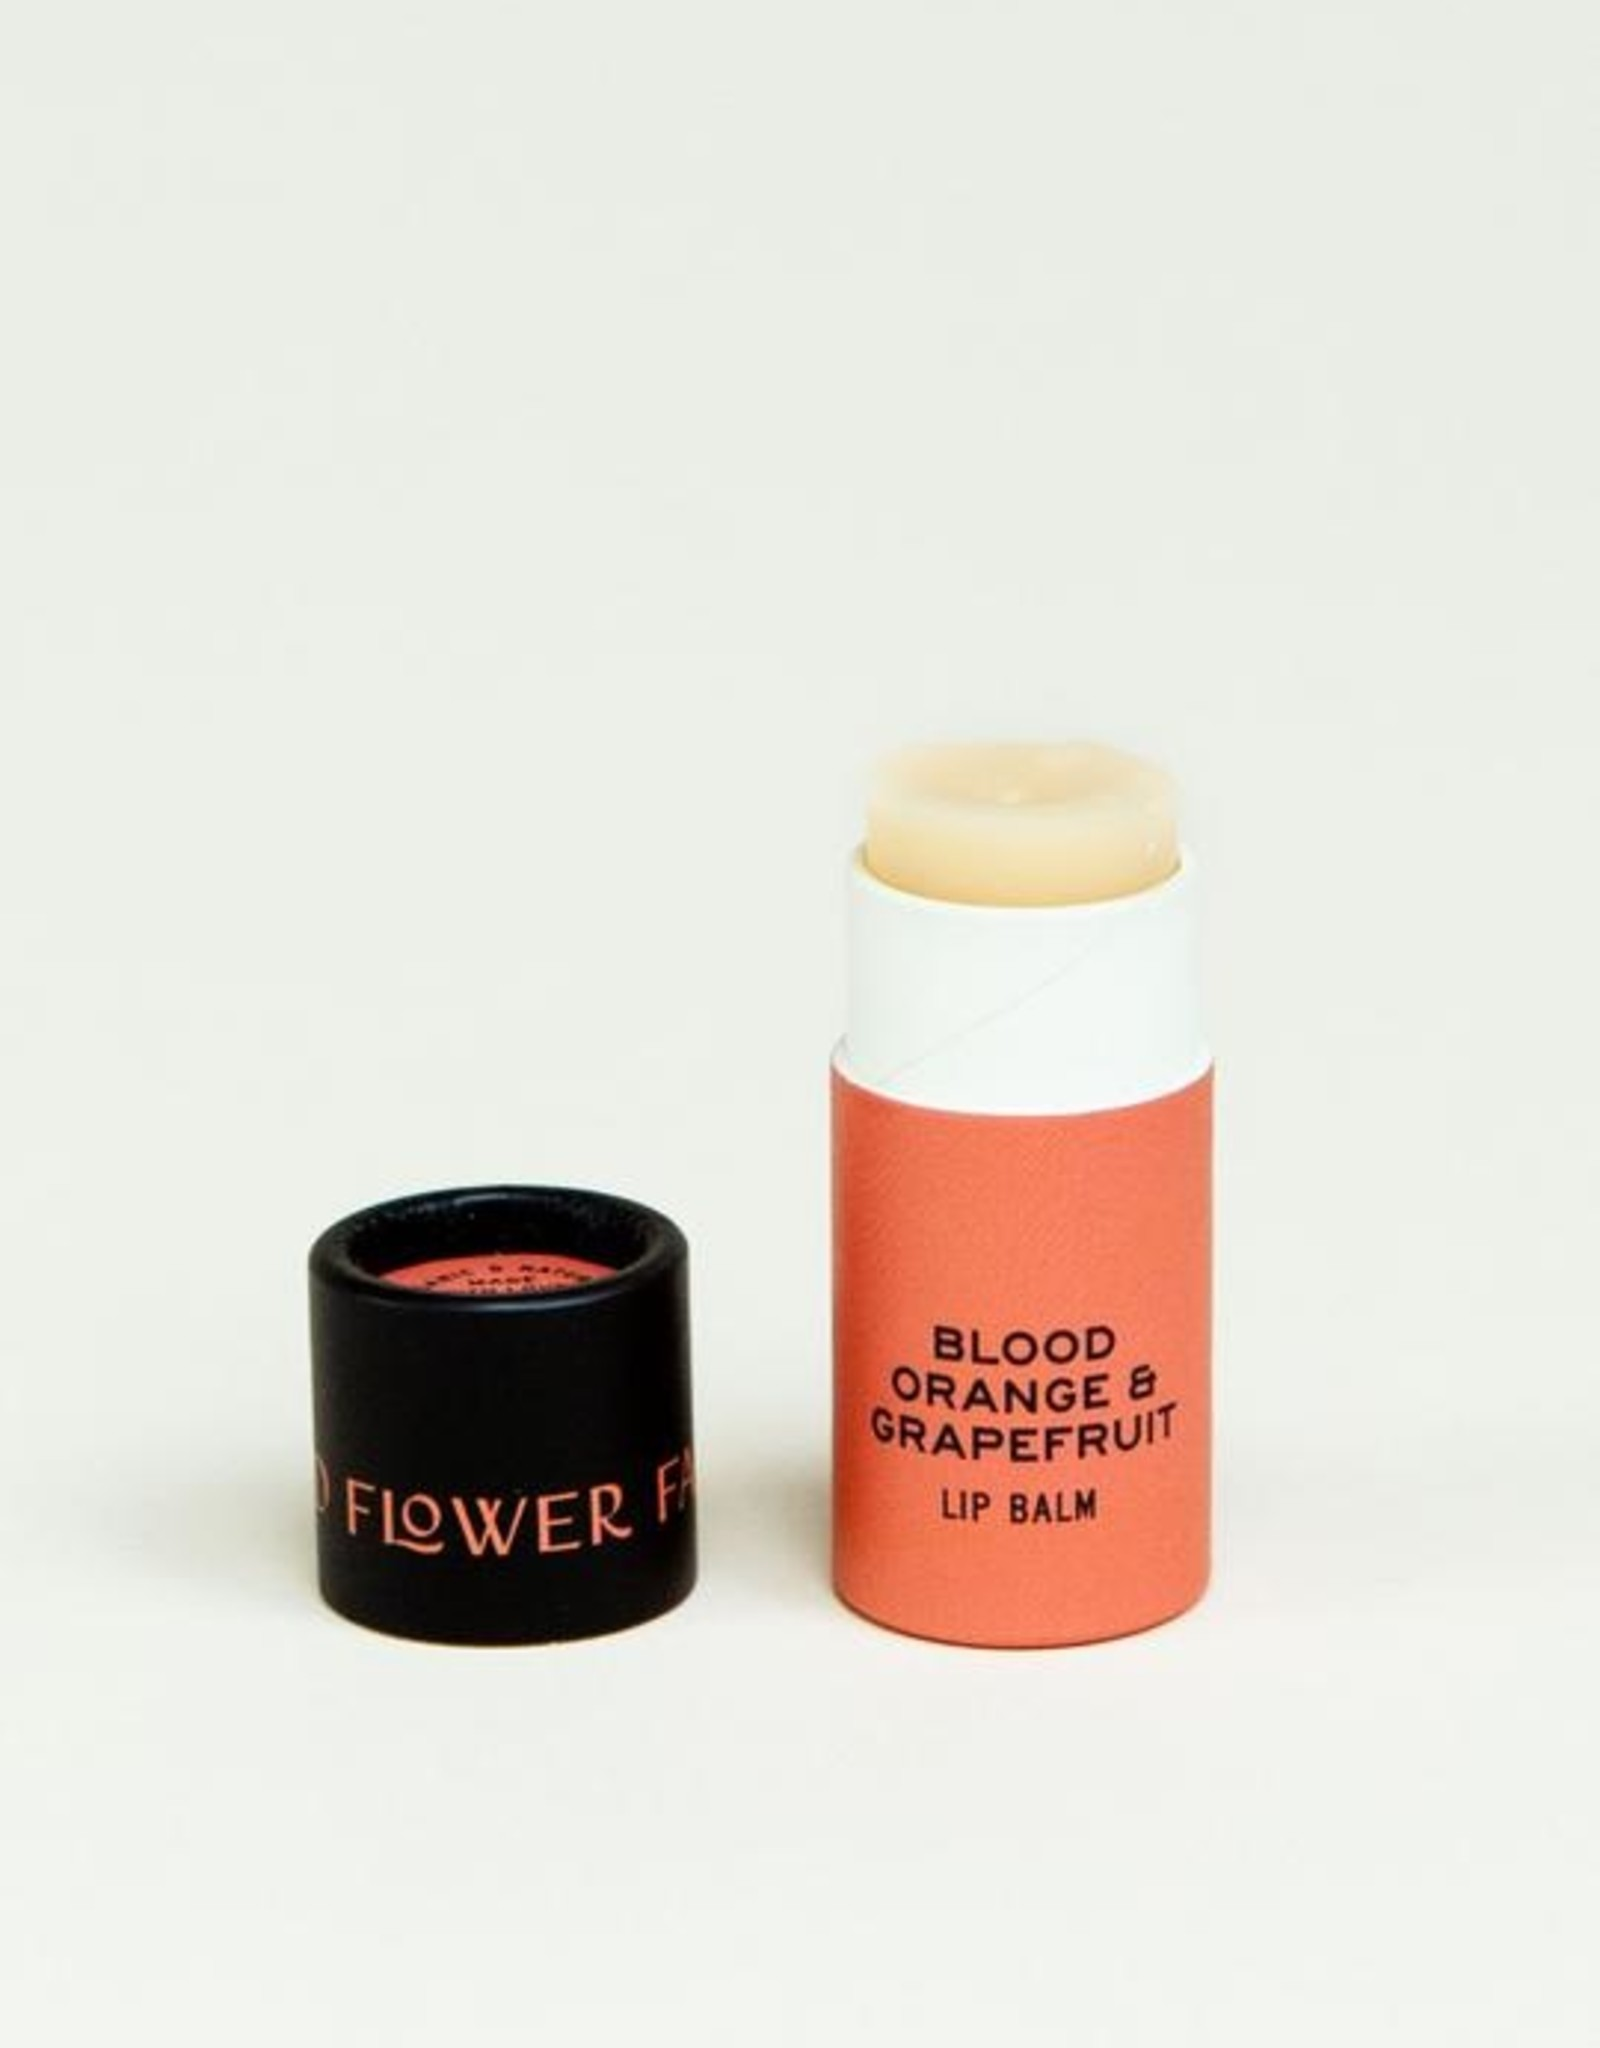 Good Flower Farm Blood Orange & Grapefruit Lip Balm